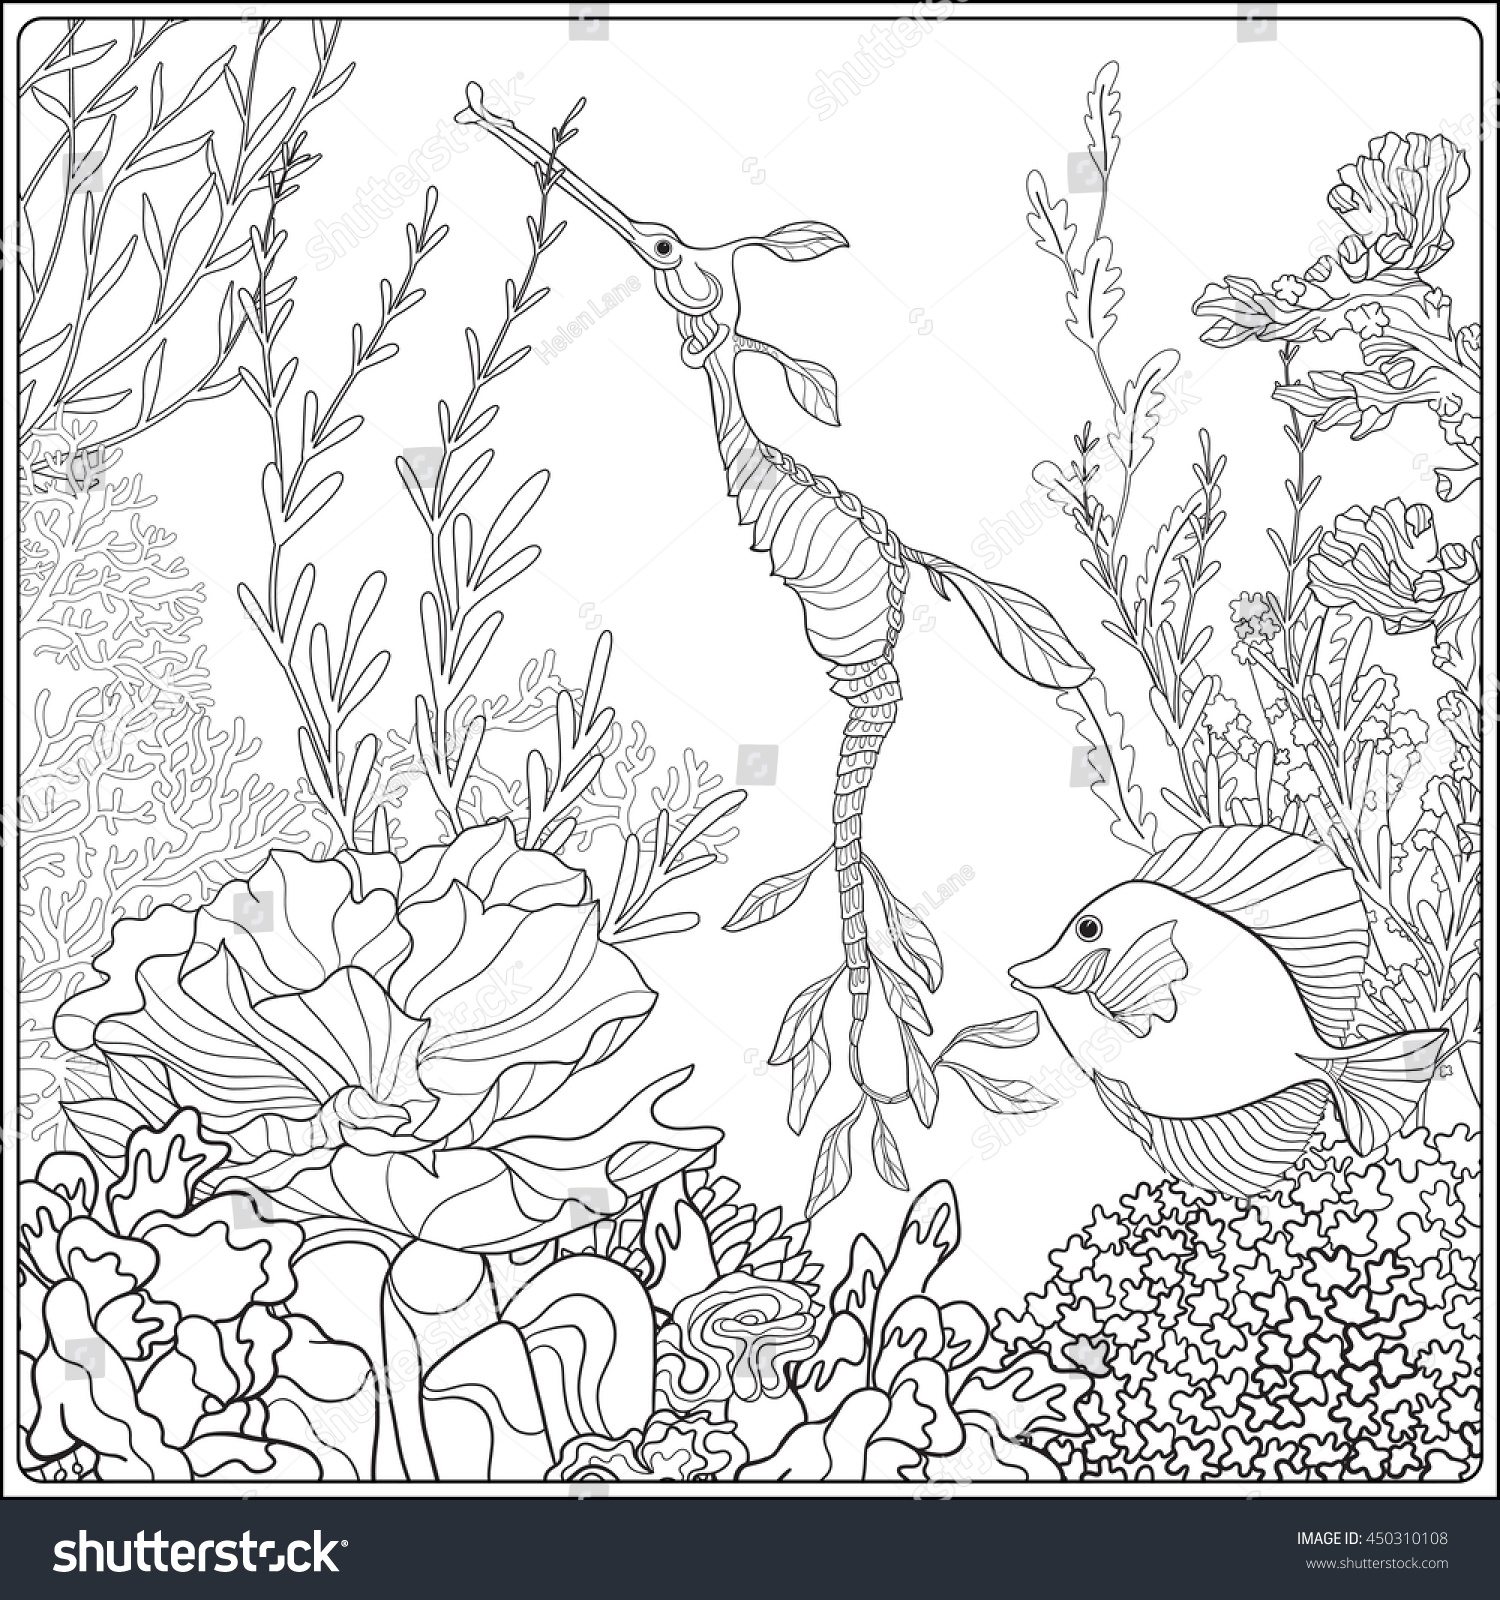 Coloring Of Coral Reefs. Coloring Book Coral Reef Fauna Cartoon Fish ...